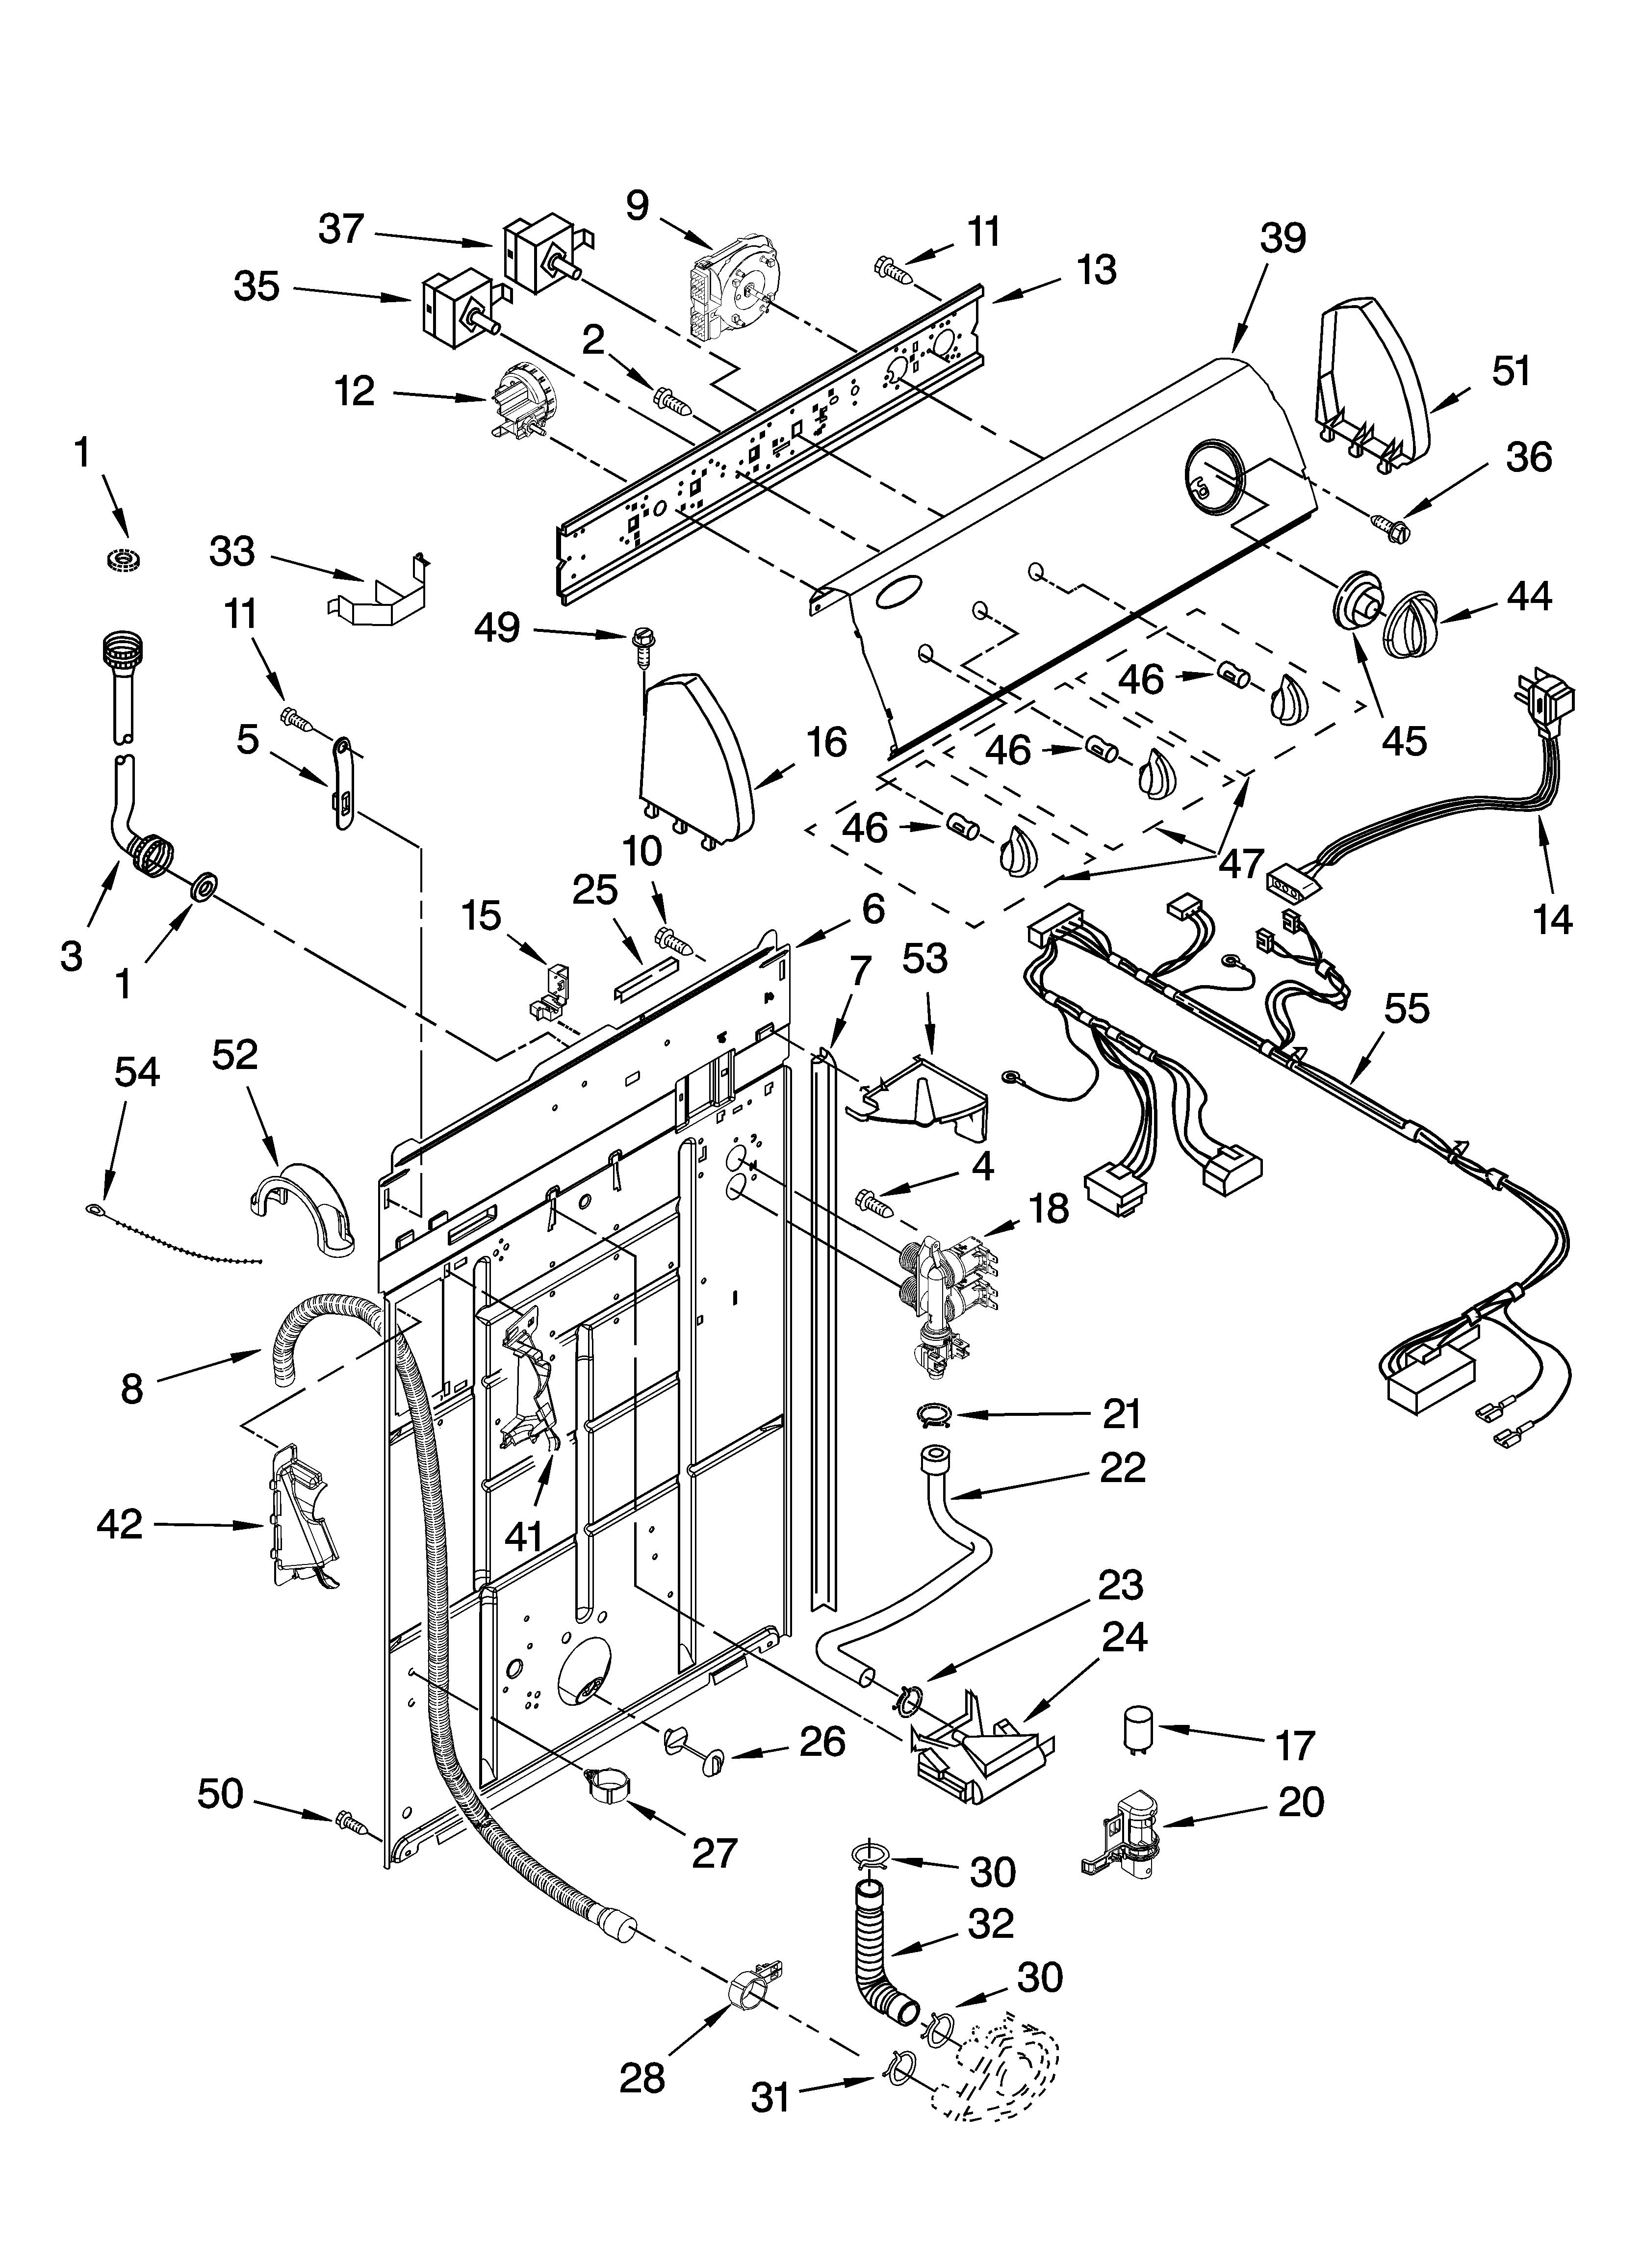 Whirlpool Cabrio Dryer Wiring Diagram